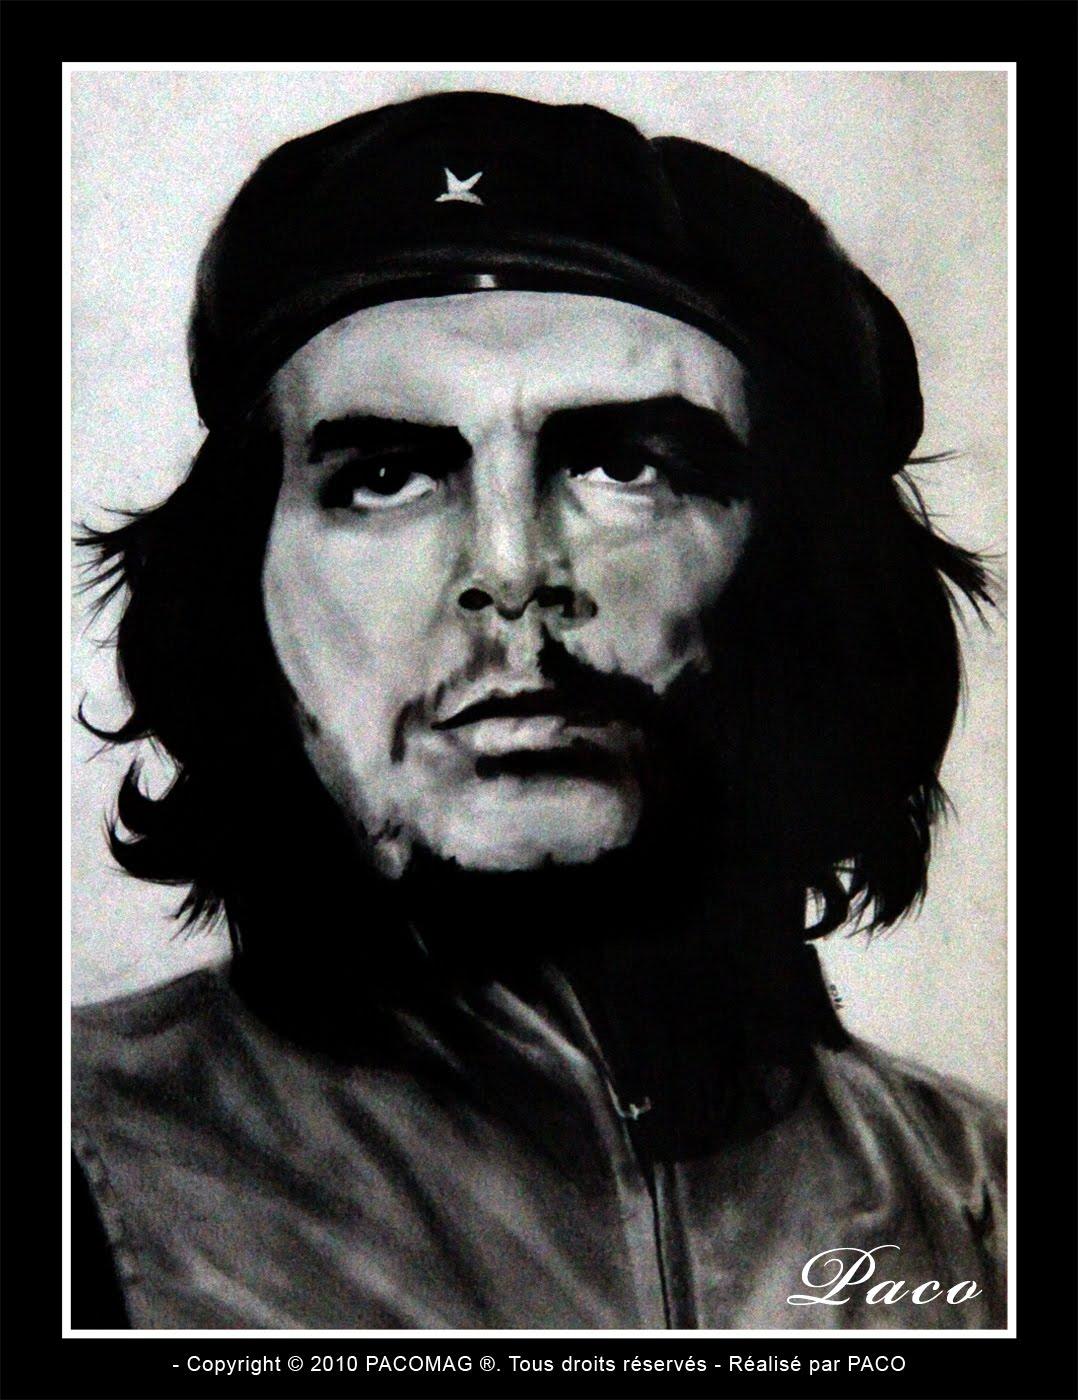 http://2.bp.blogspot.com/-MW7uibBzRiM/T-SgjxiUITI/AAAAAAAAA1U/PycrZedxXKQ/s1600/portrait-d-Ernesto-Che-Guevarra-par-paco-illustrateur-graphiste-artiste-peintre.jpg